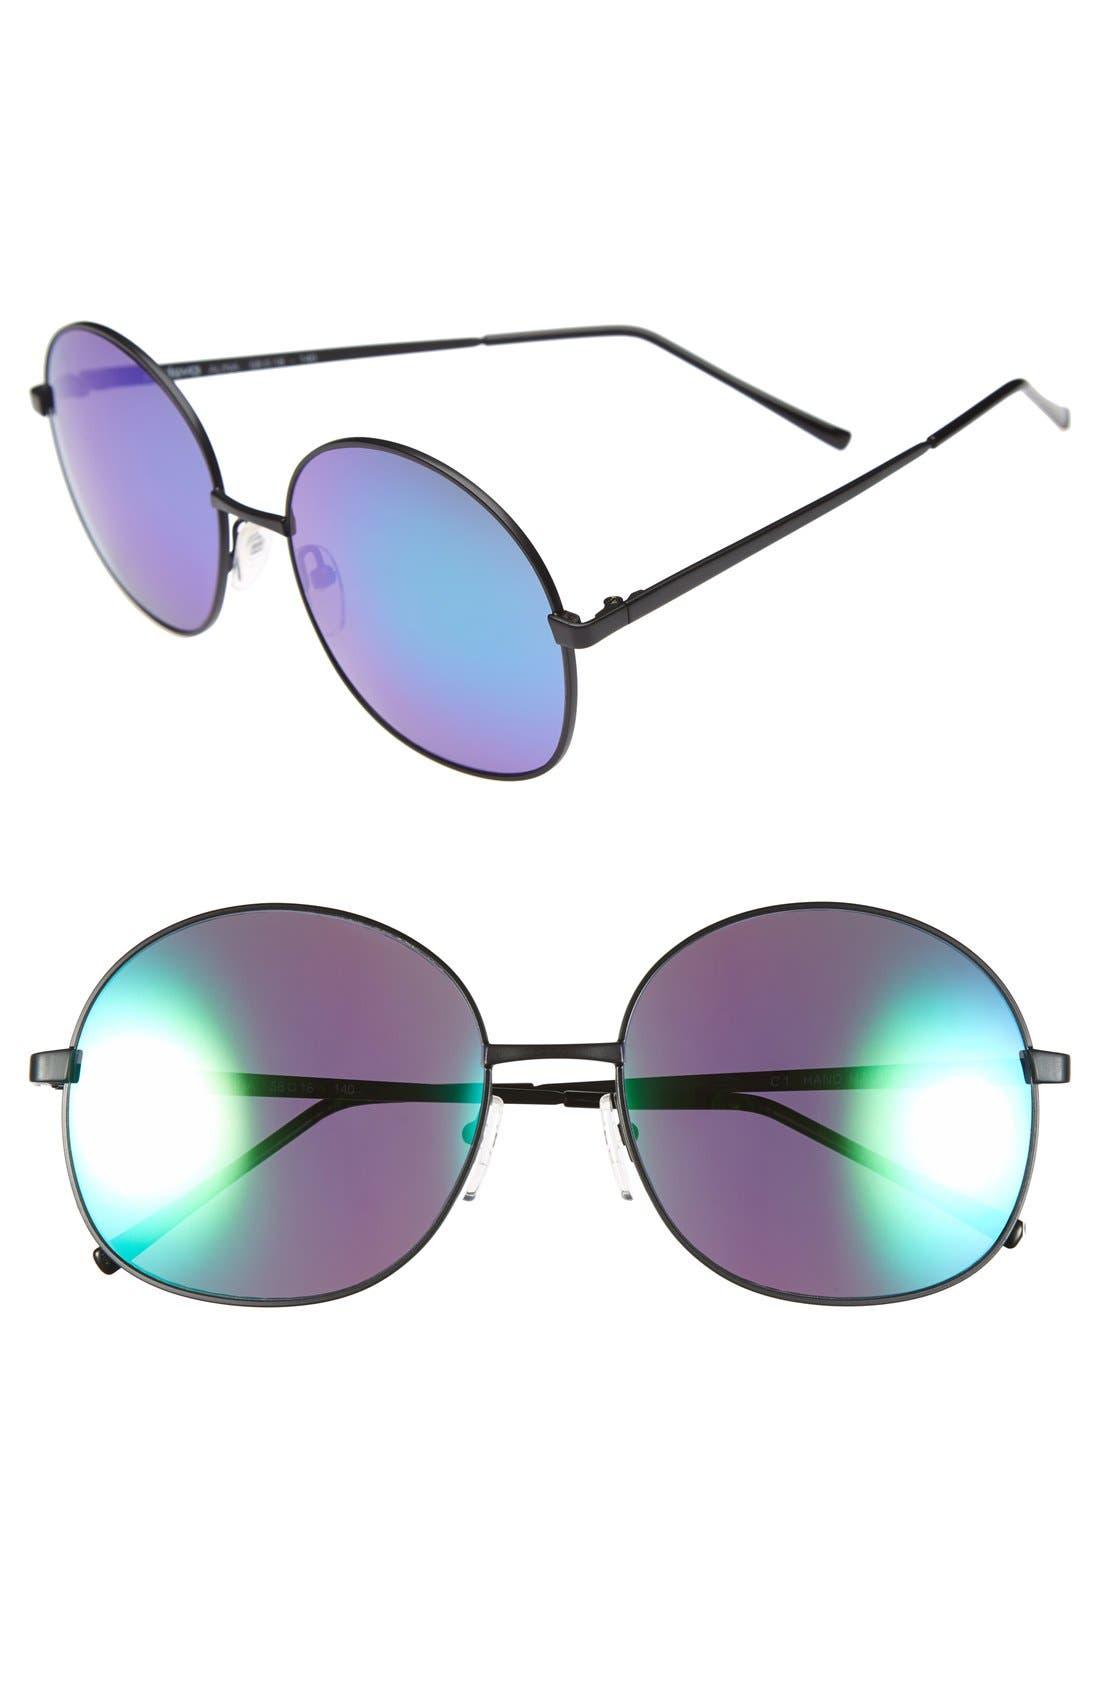 Alternate Image 1 Selected - Illesteva 'Alina' 58mm Sunglasses